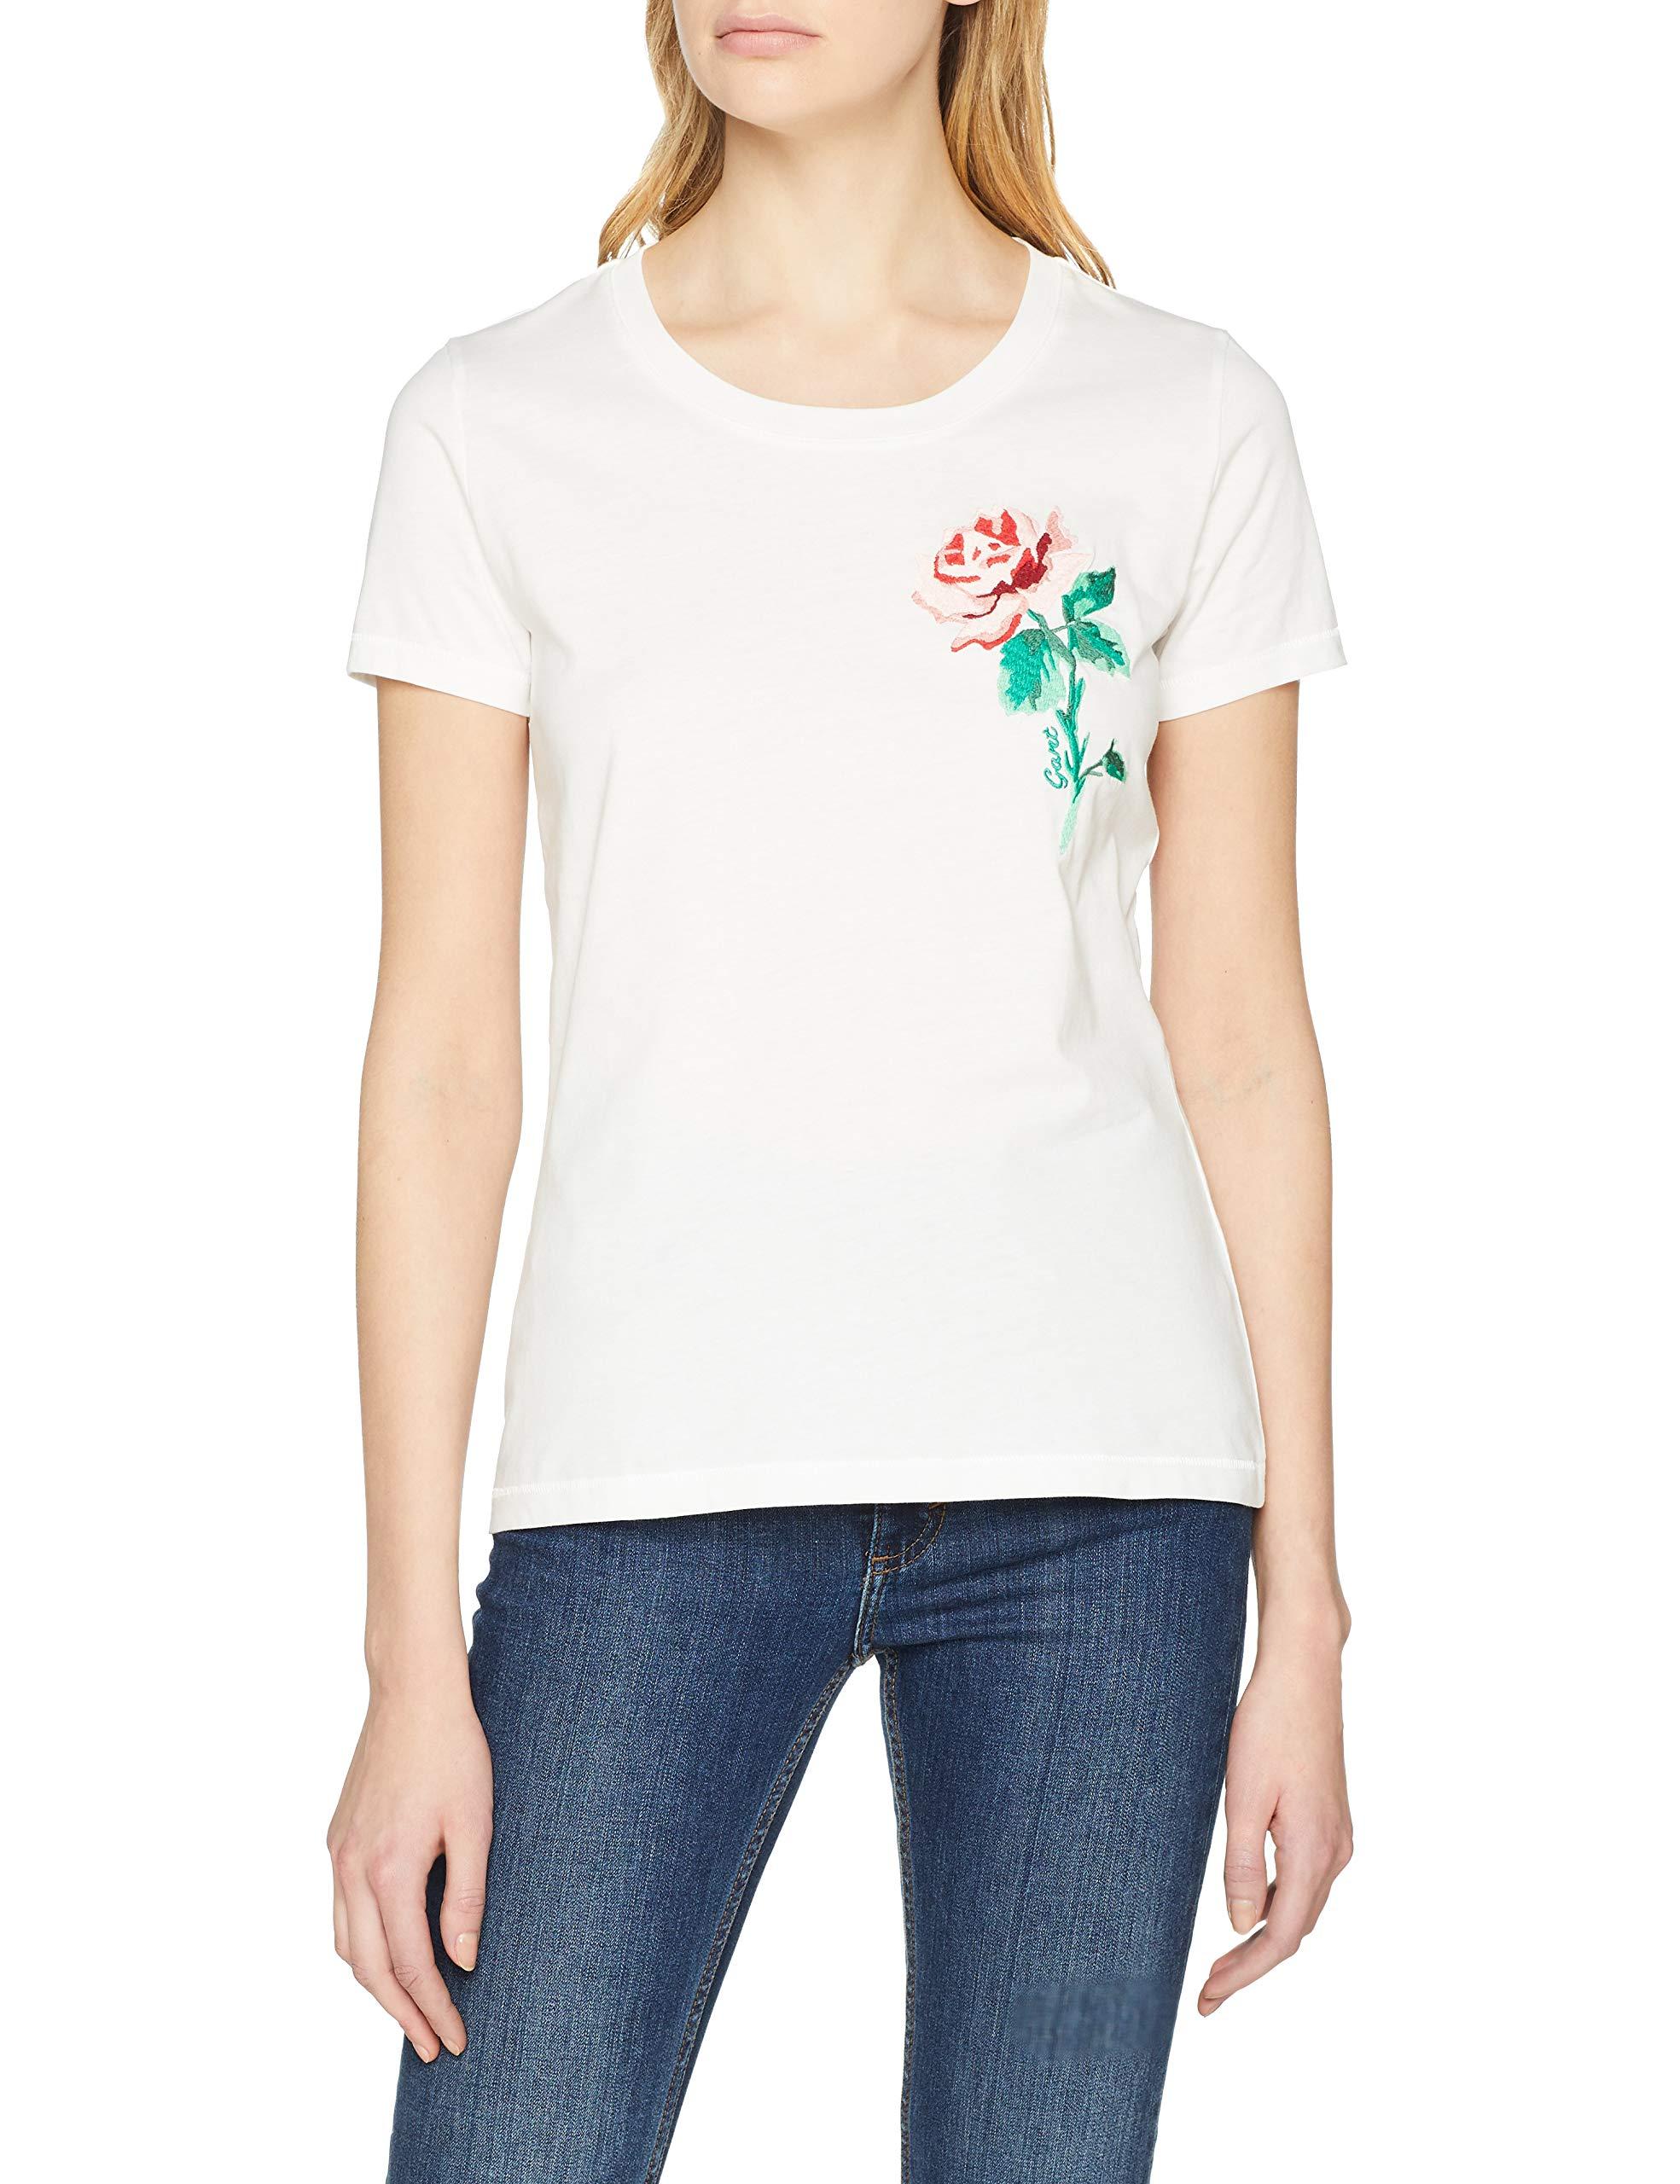 T shirt Gant Femme C 113Medium O1Rose neck TBeigeeggshell Ss fv7mIYb6gy